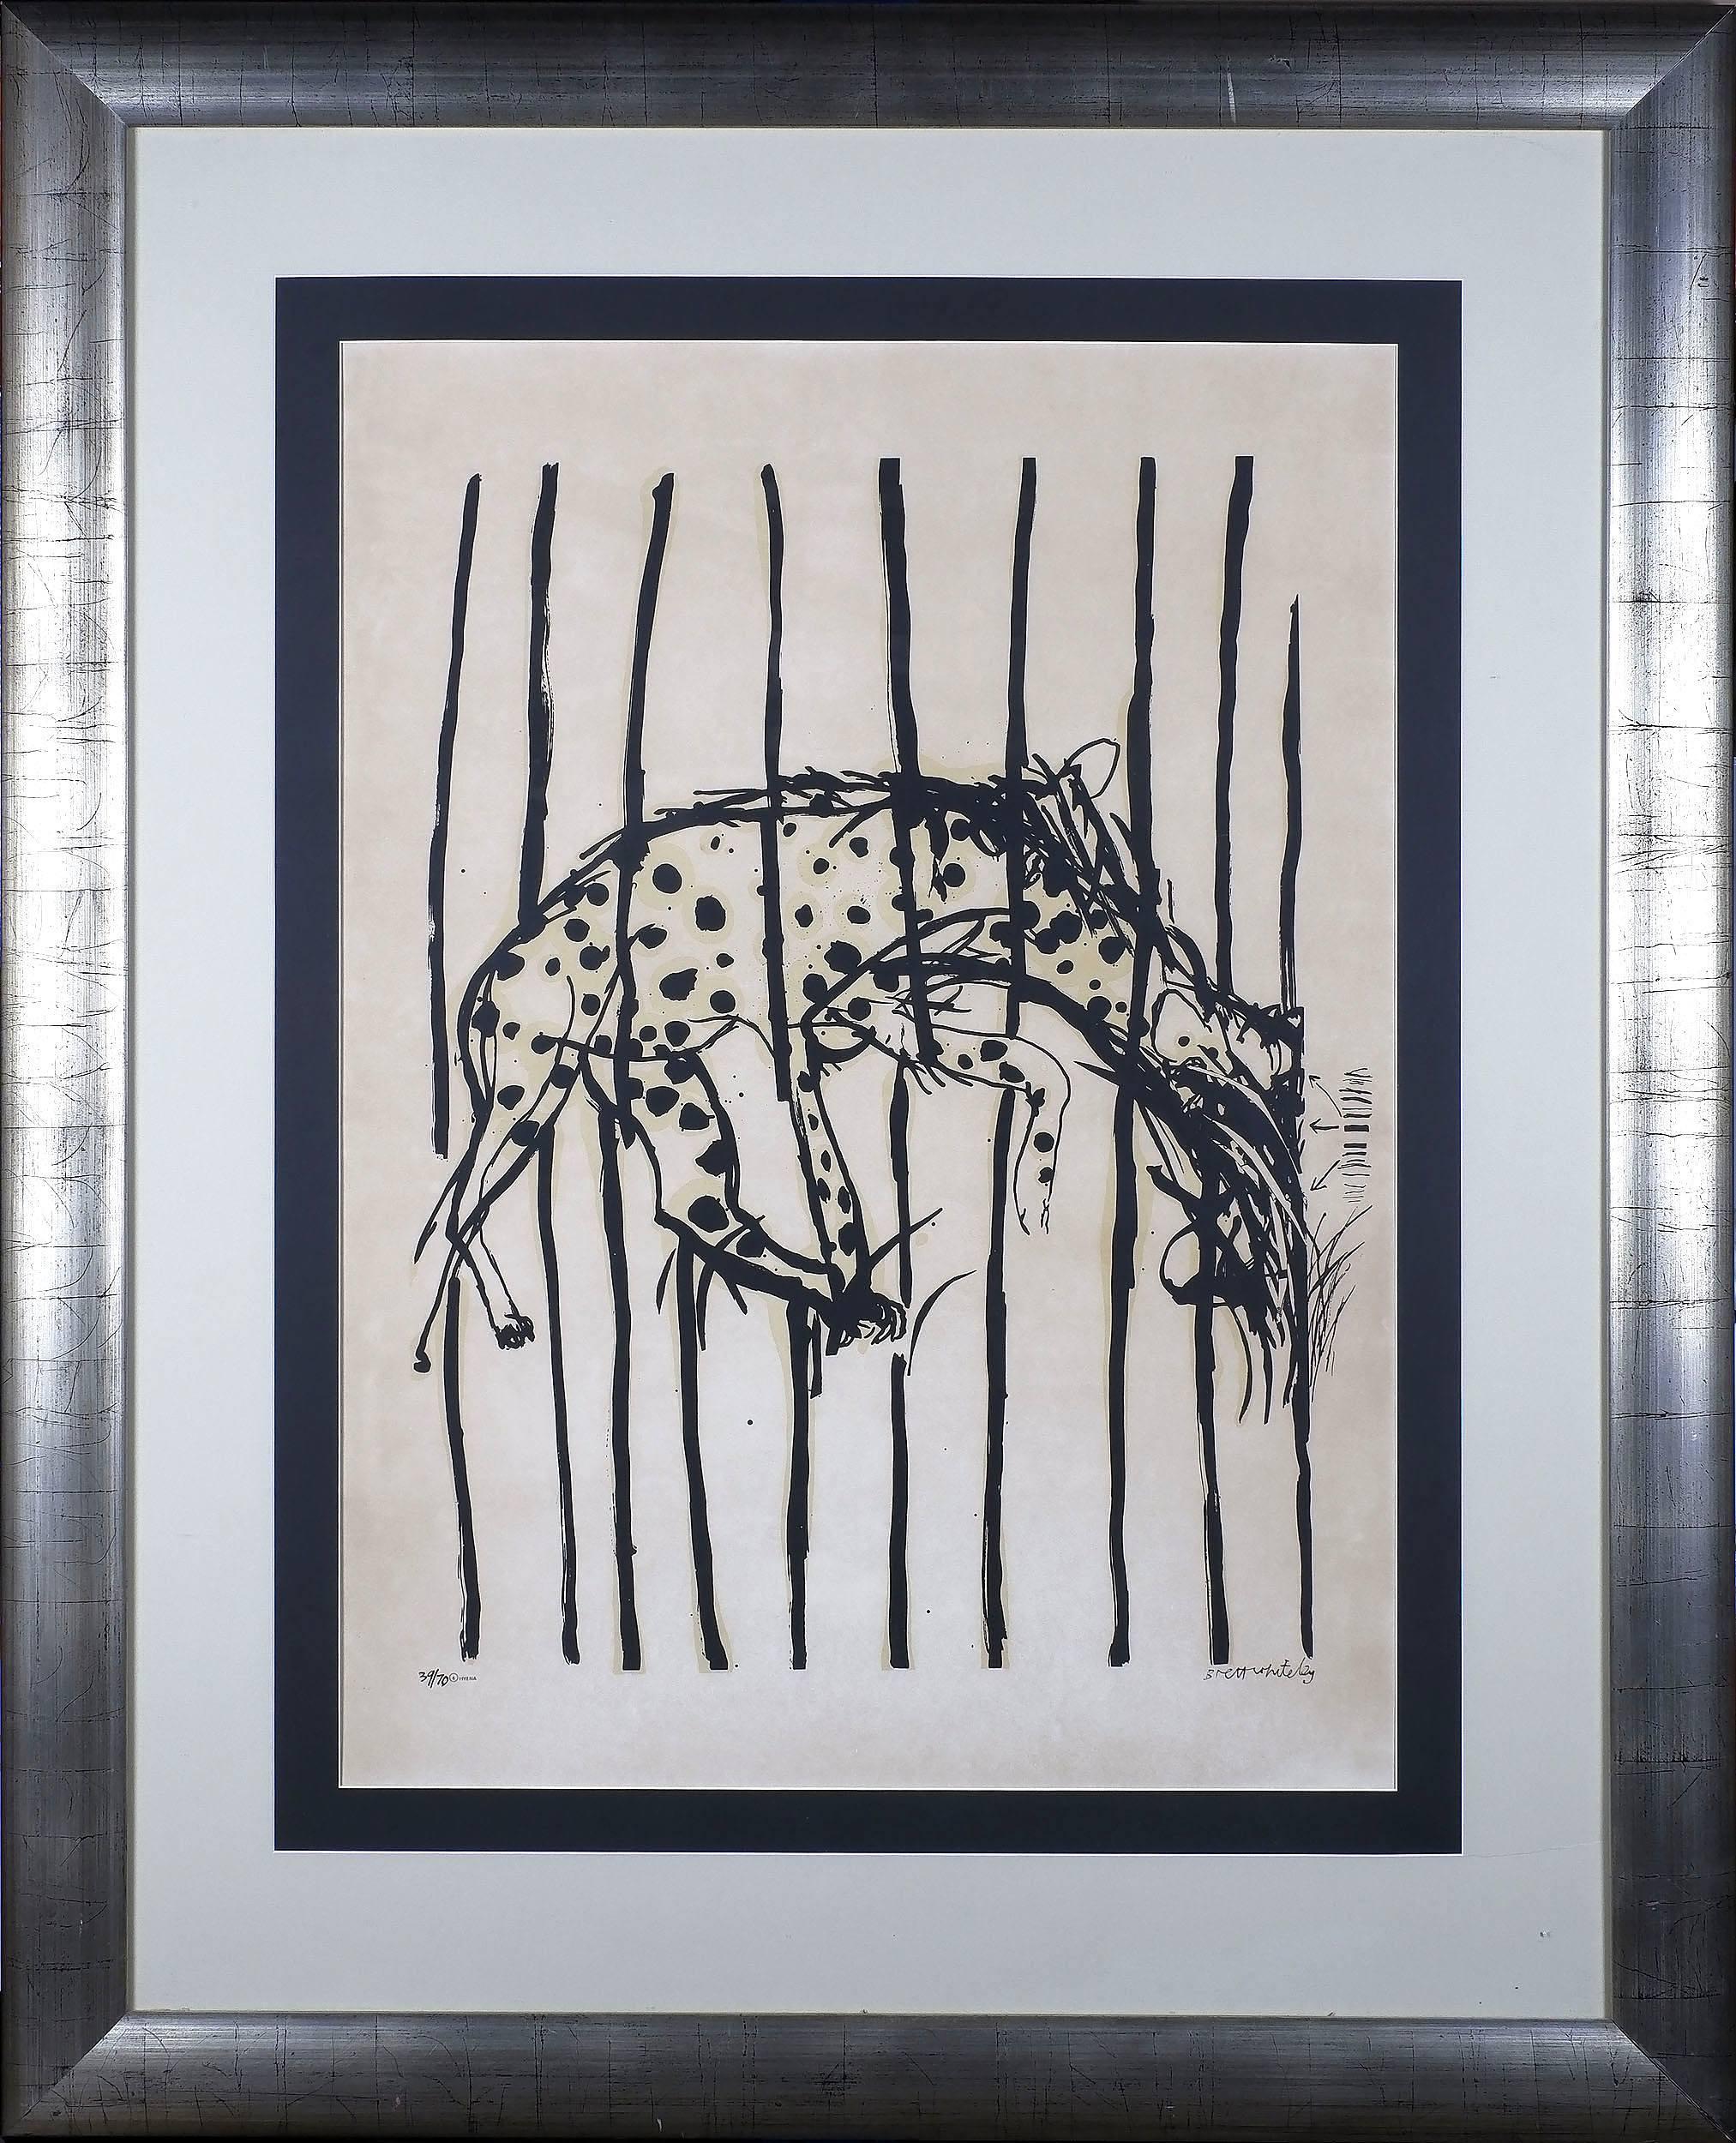 'Brett Whiteley (1939-1992) Hyena from the Regent Street Zoo, Colour Screenprint Edition 39/70'